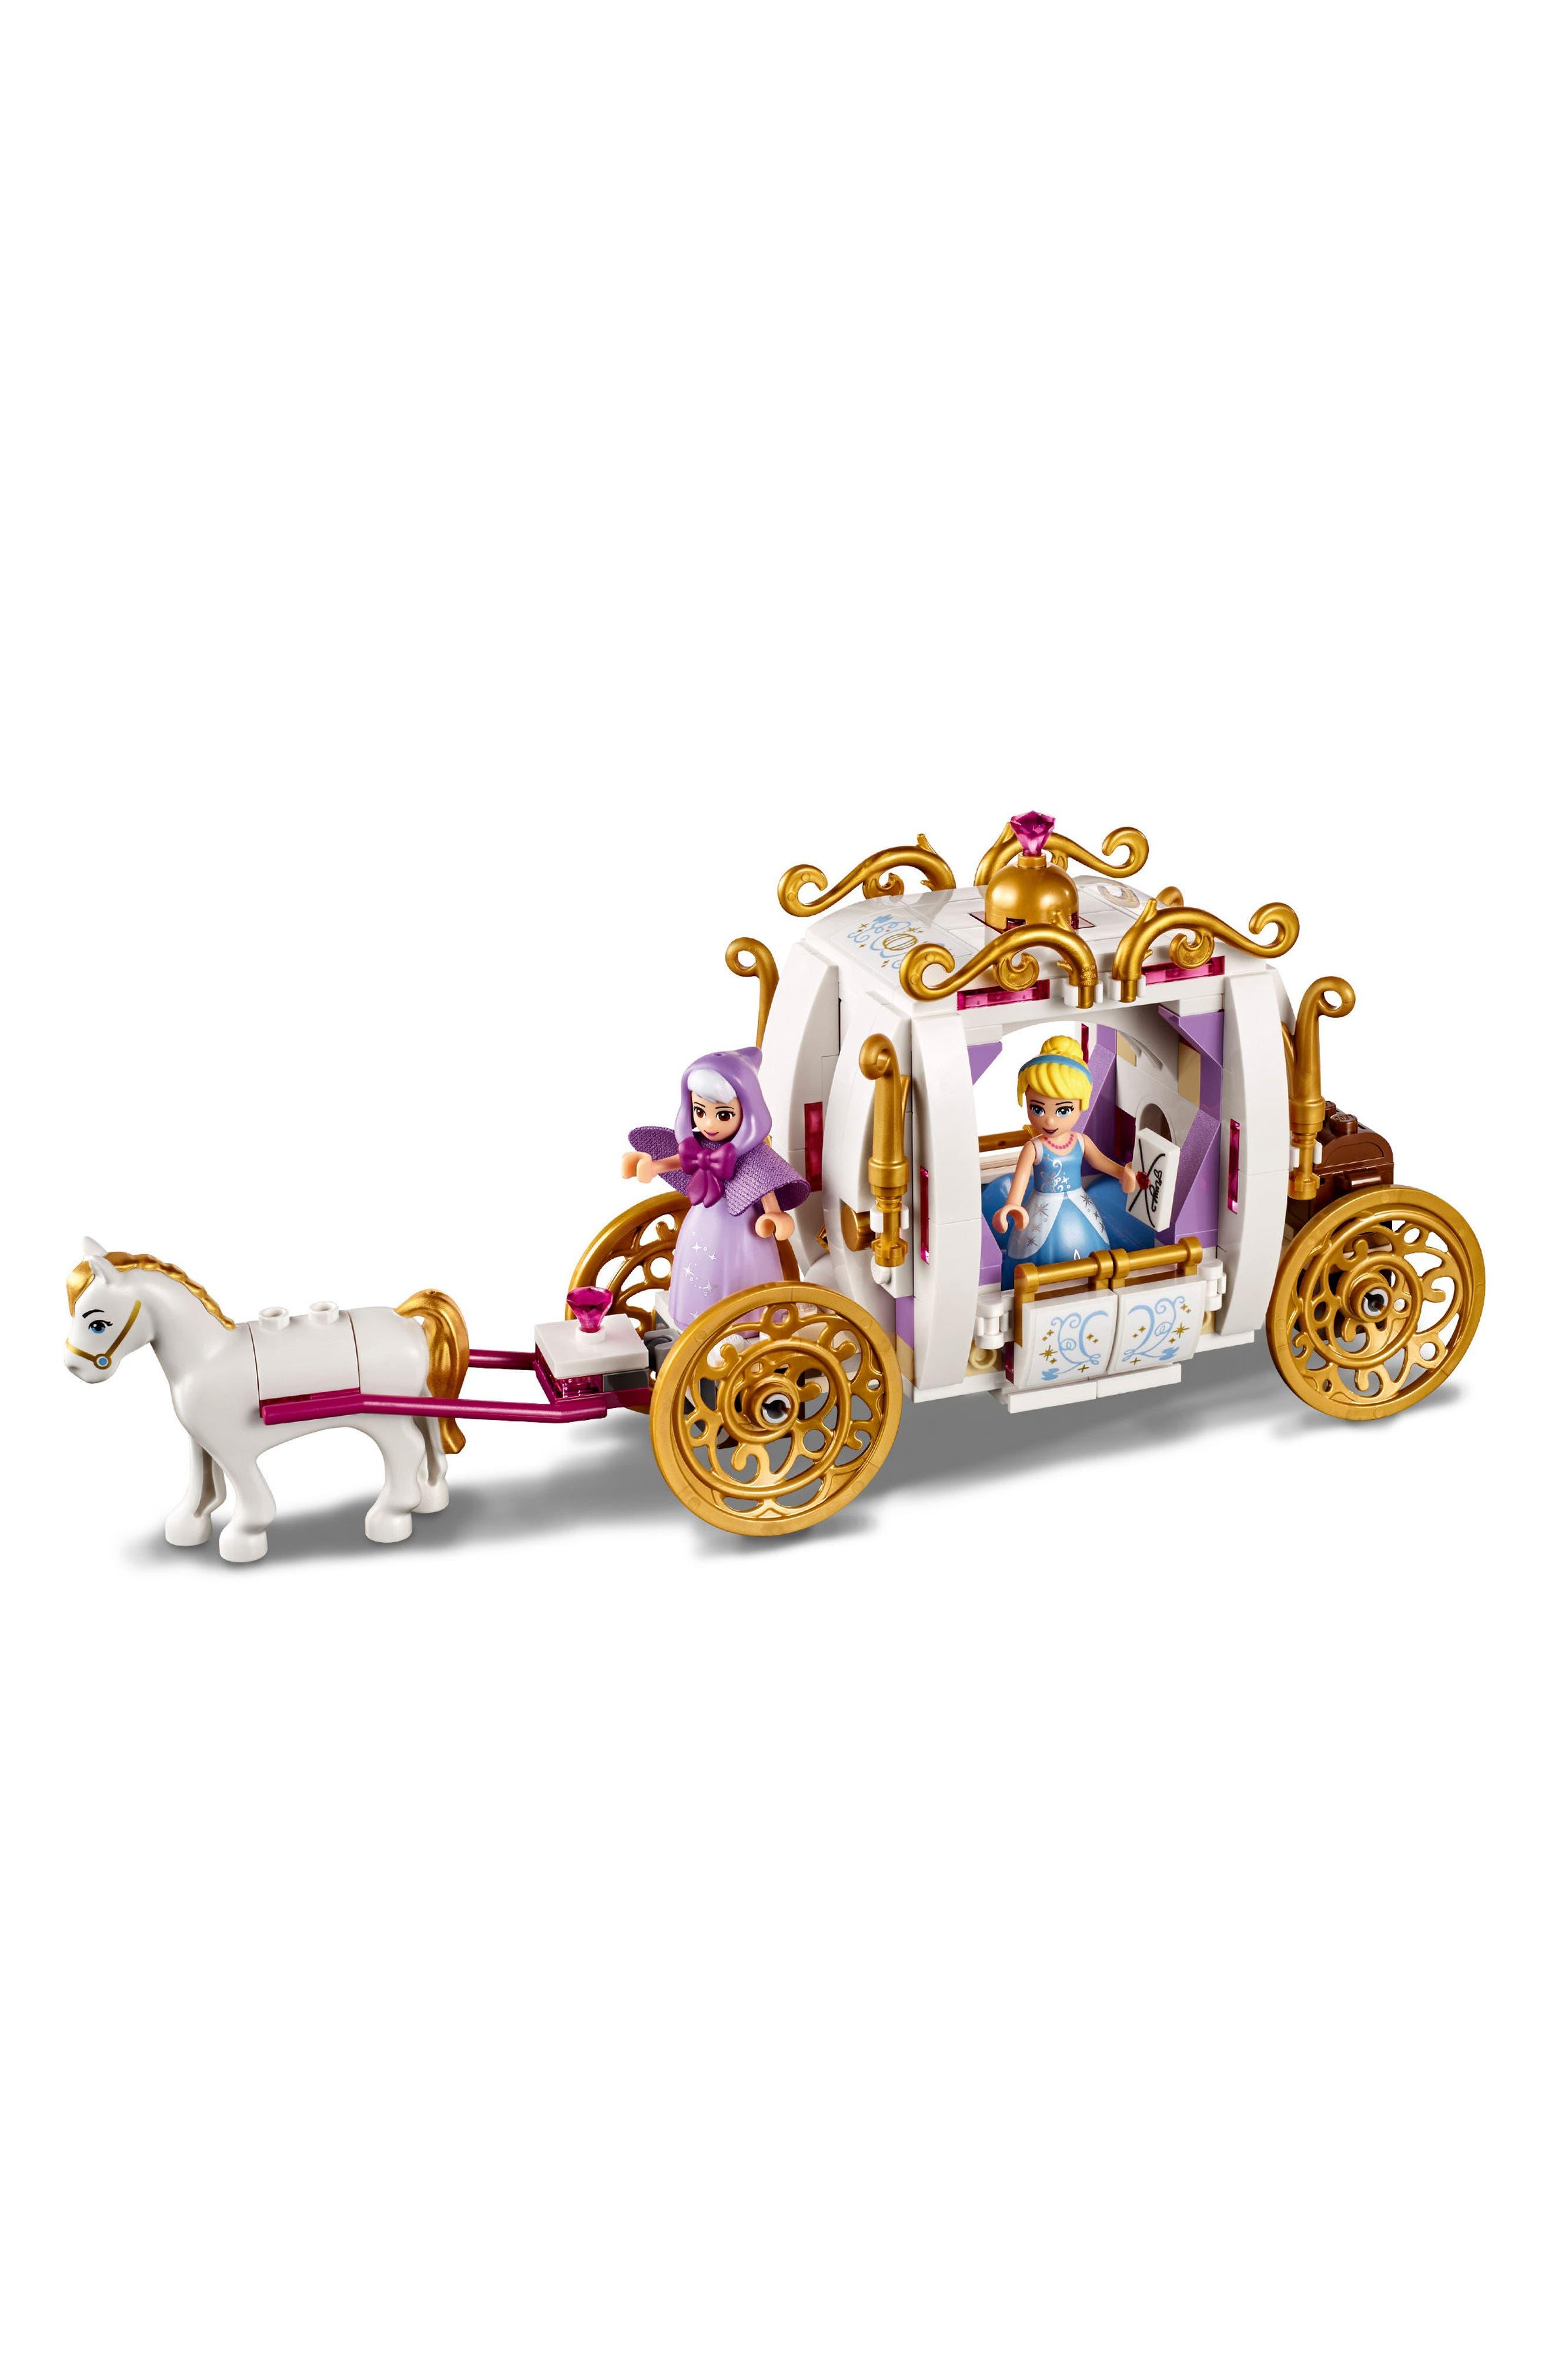 Disney<sup>™</sup> Cinderella's Enchanted Evening Play Set - 41146,                             Alternate thumbnail 4, color,                             Multi